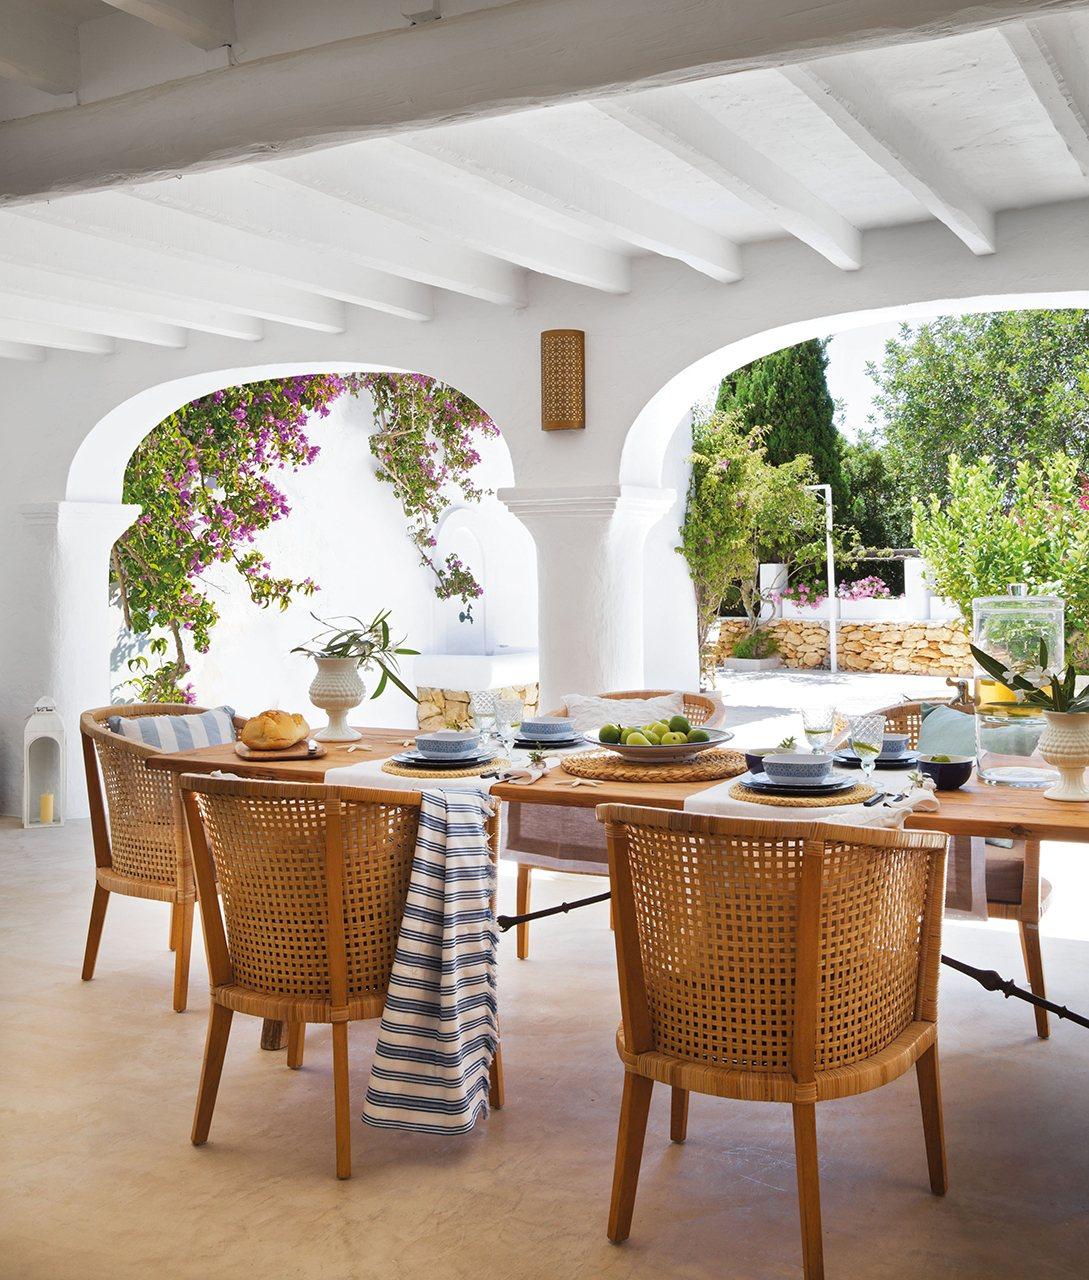 Amenajare n stil mediteranean n ibiza jurnal de design for Terrazas ibicencas